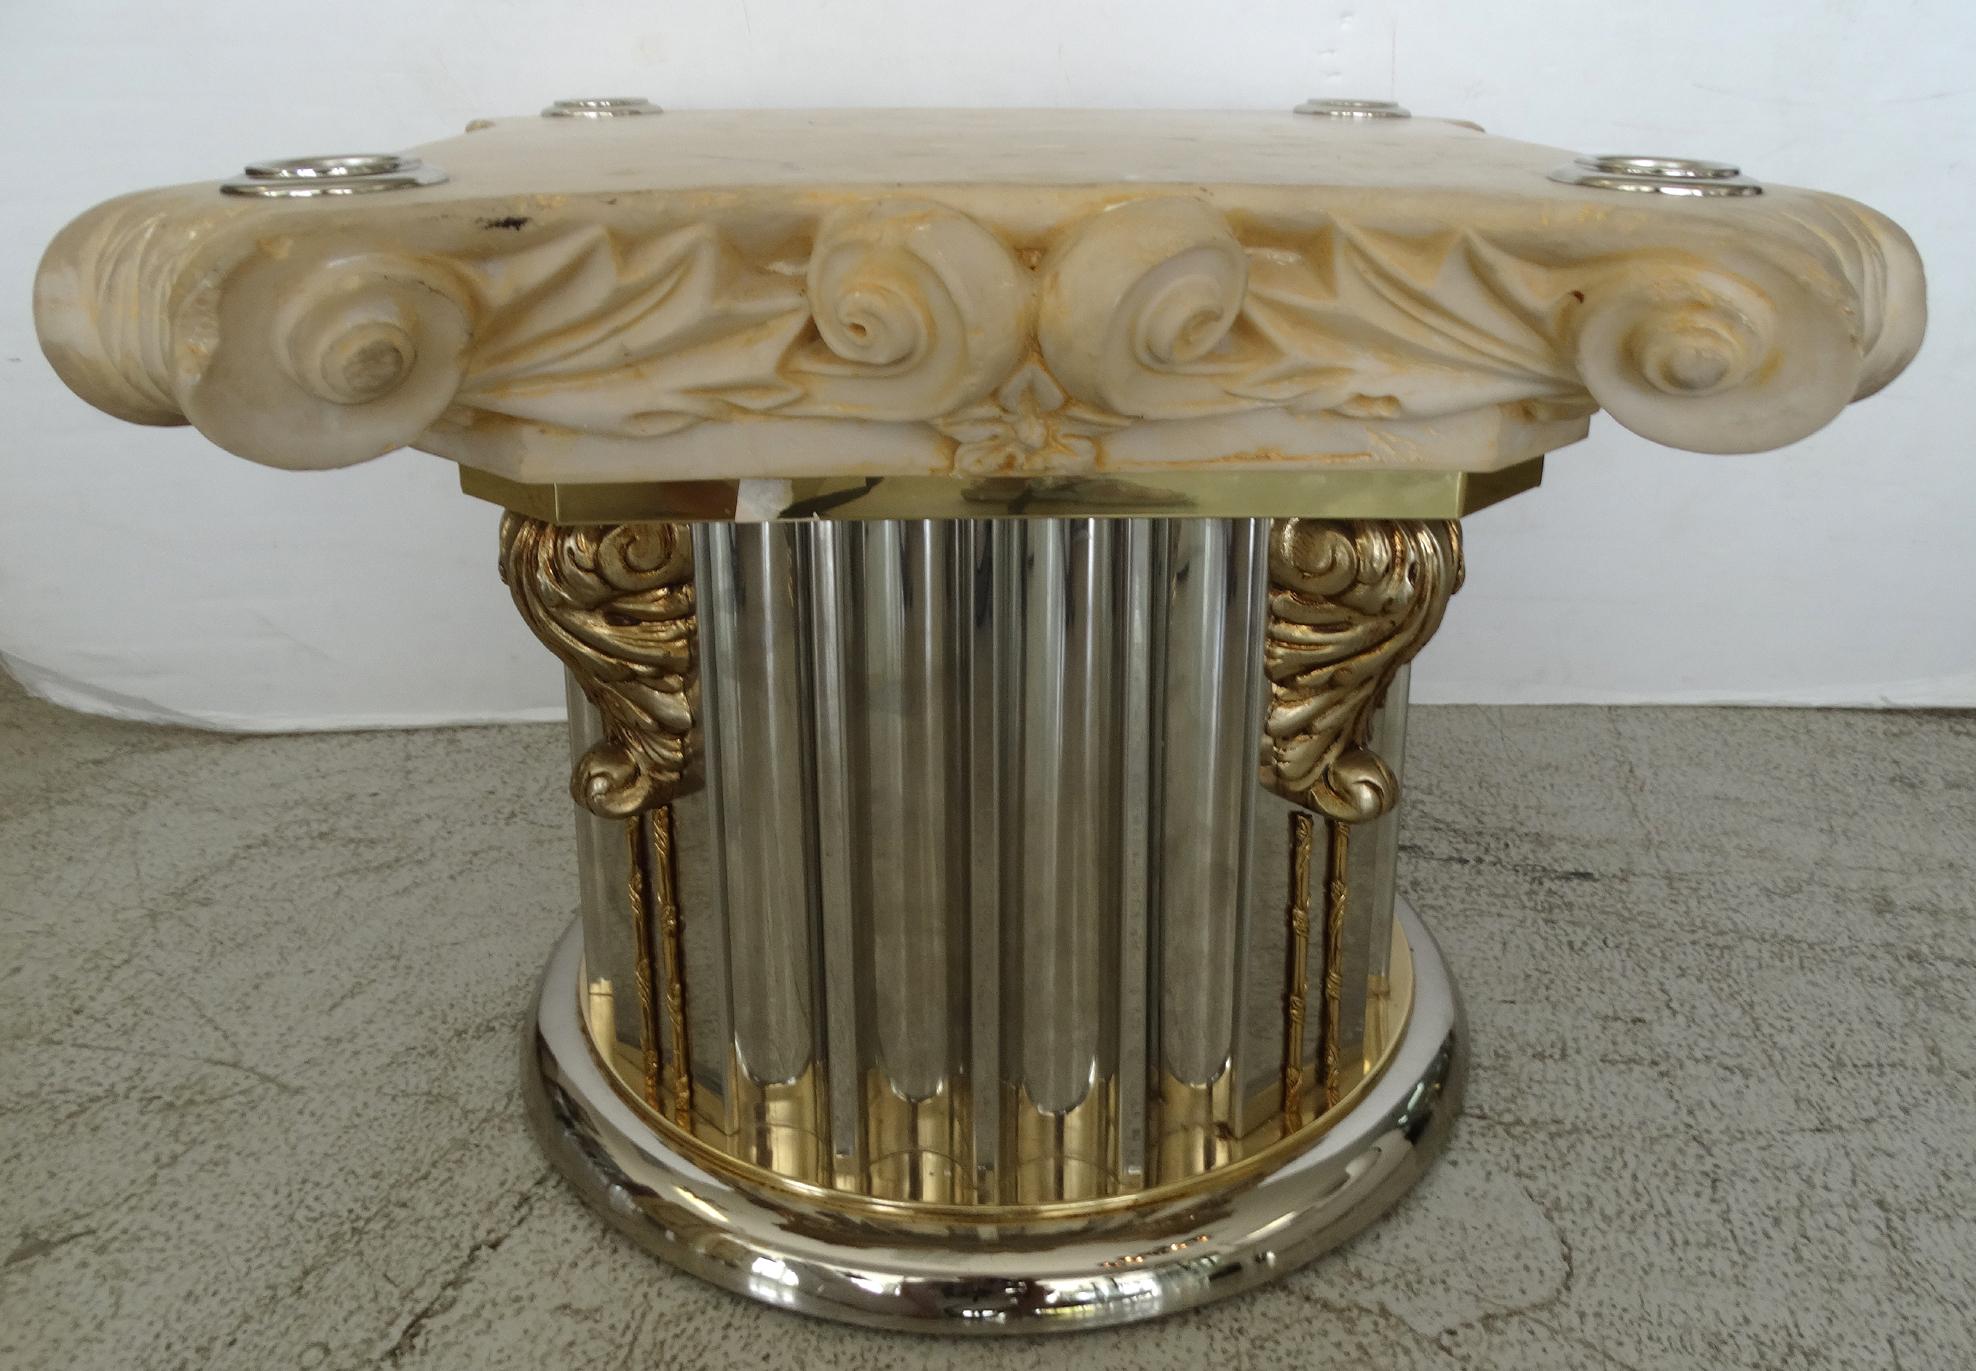 Corinthian Column Capital Table Base Chairish : 07be70f5 bdac 4f8a a8e6 0bbebc1c7831aspectfitampwidth640ampheight640 from www.chairish.com size 640 x 640 jpeg 47kB